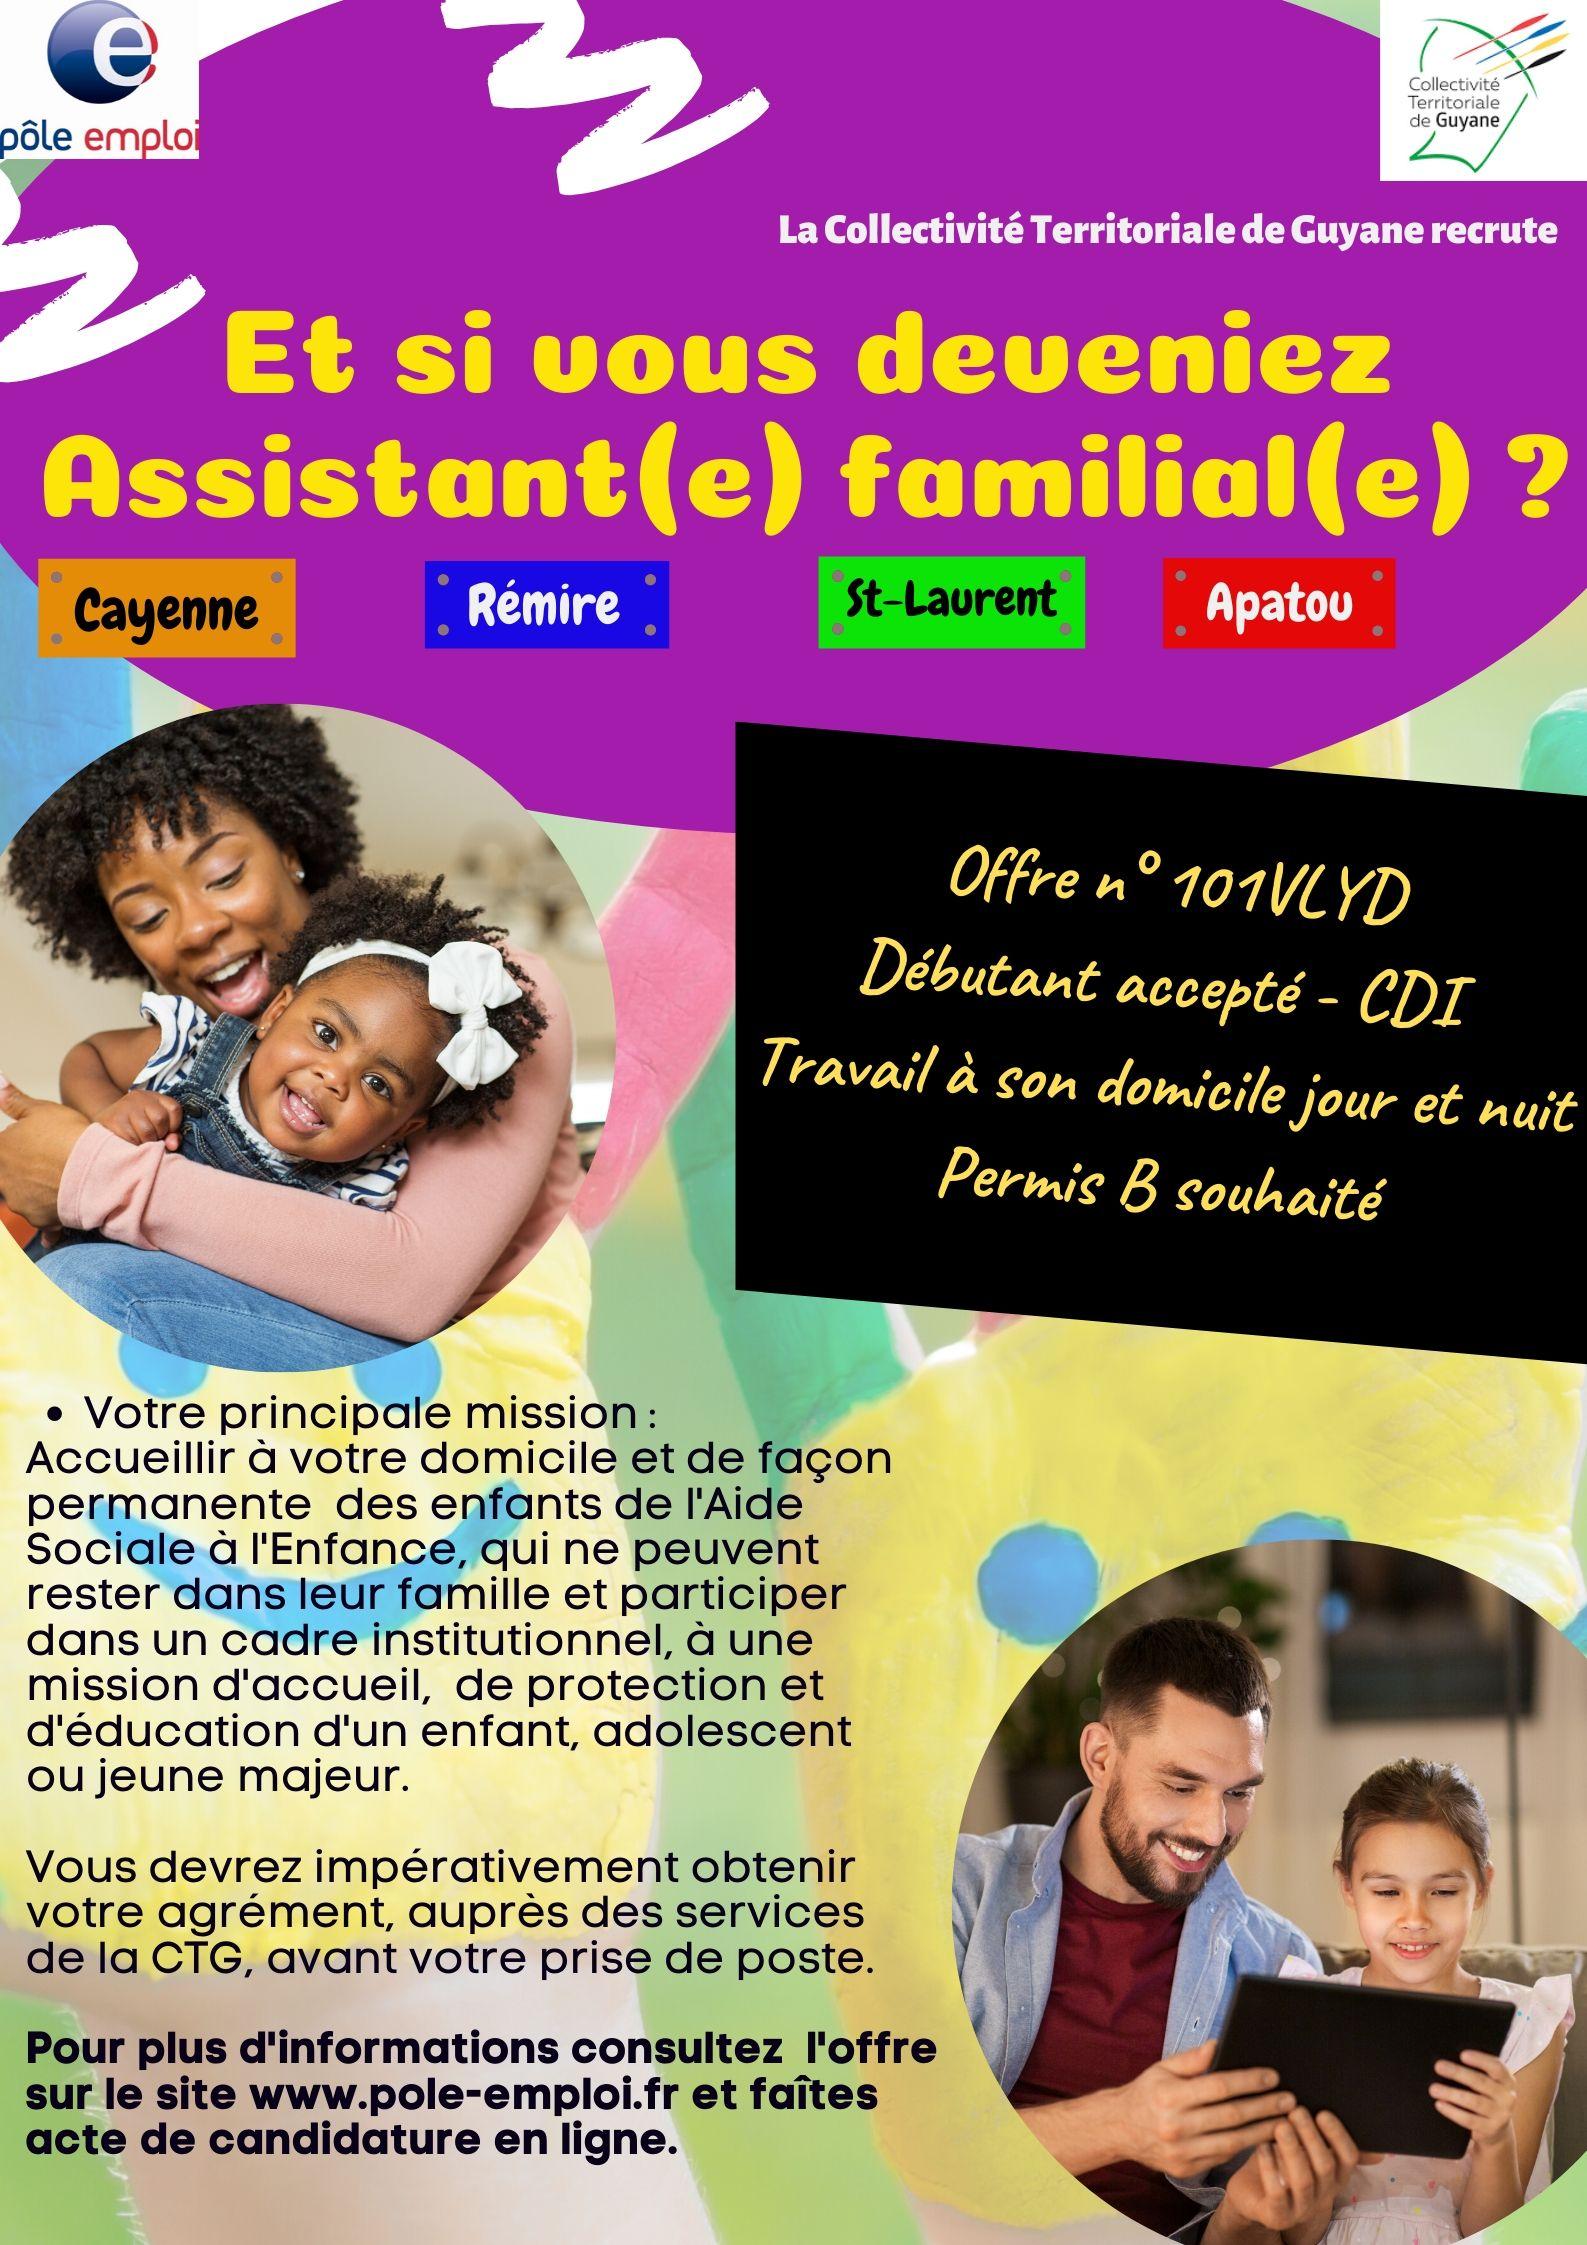 Recrutement Assistant(e) Familial(e) Pôle emploi